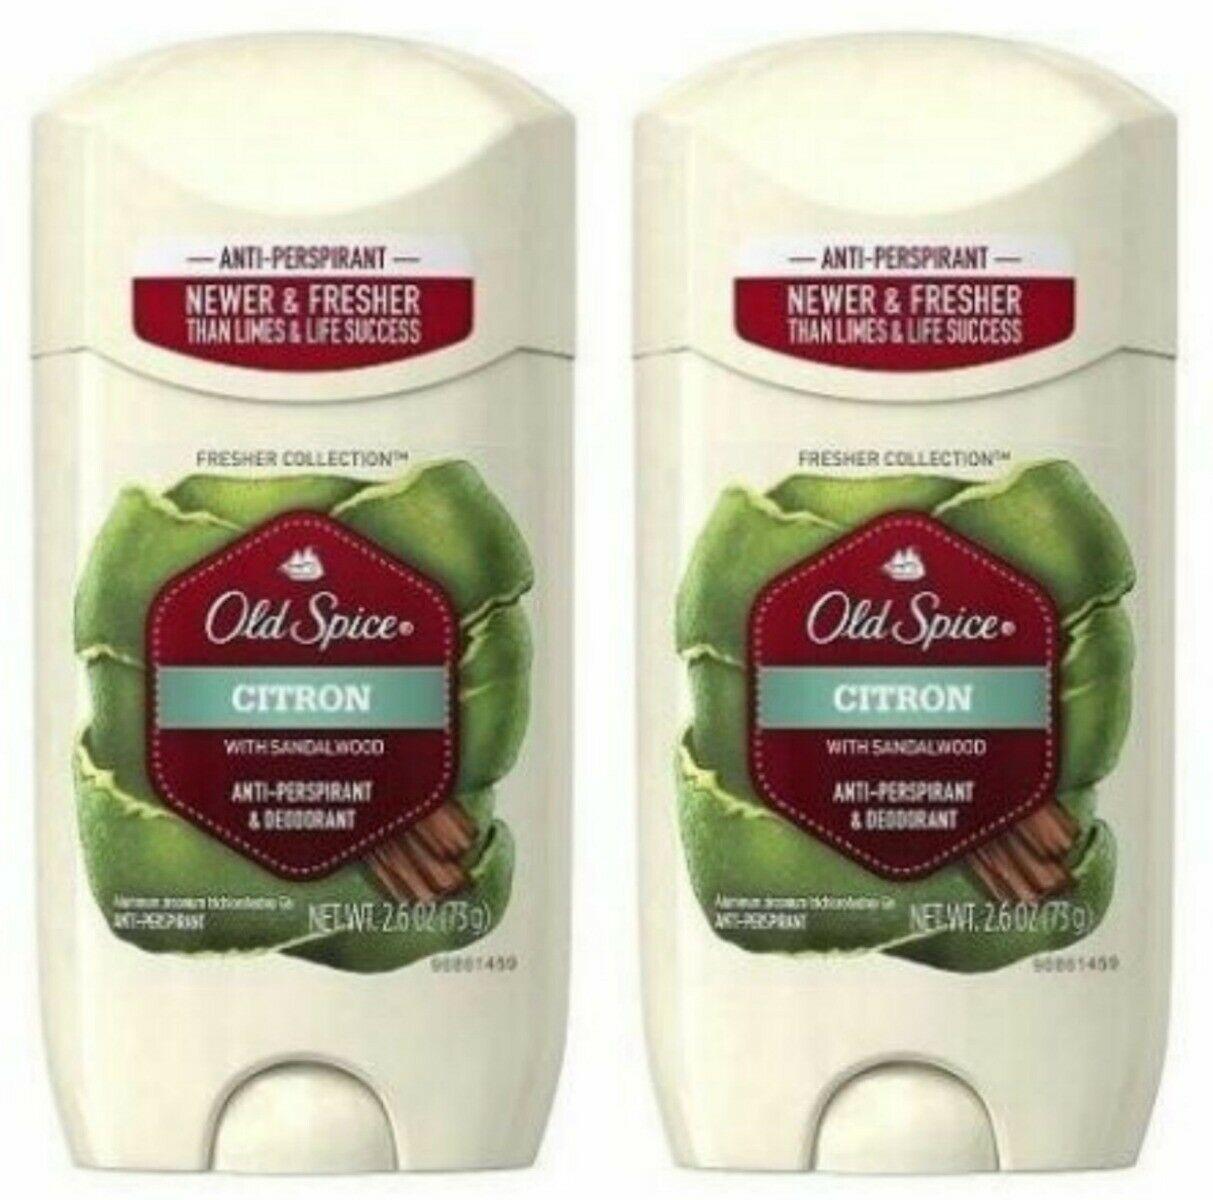 6 Old Spice Citron Sandalwood Deodorant/Anti Perspirant Mens 2.6 oz Solid Lot image 8